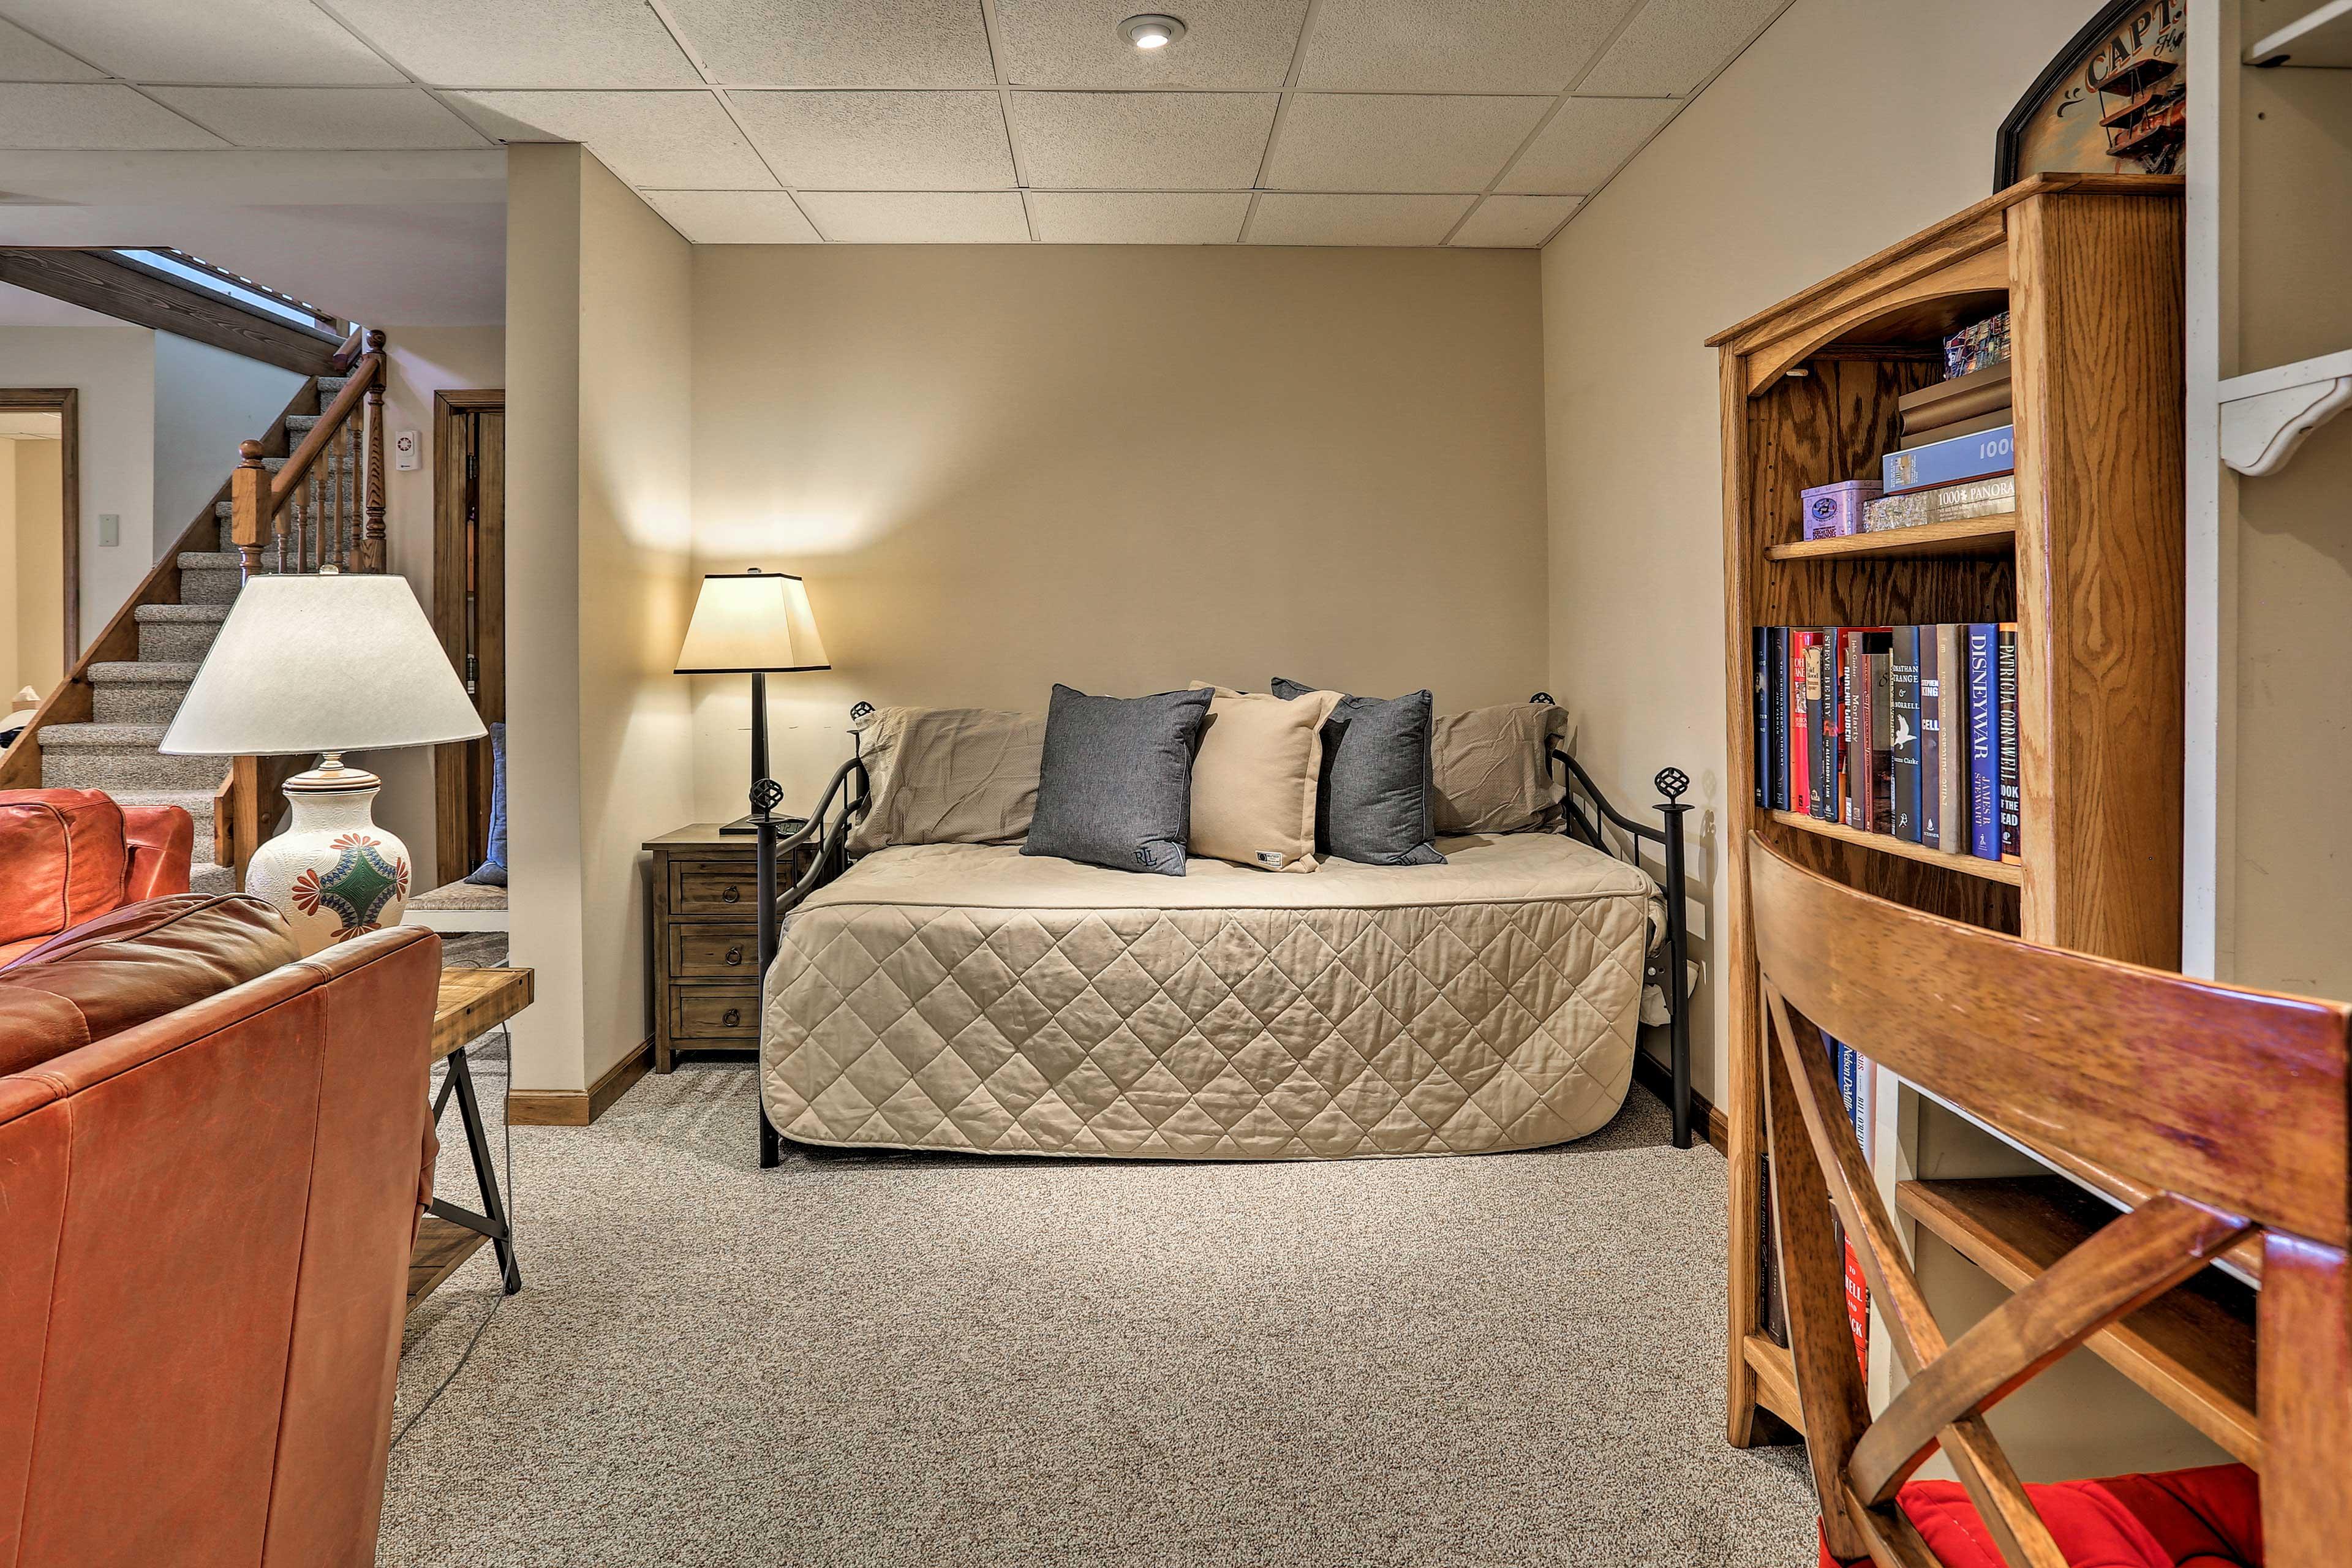 The basement sleeps 2 additional guests.